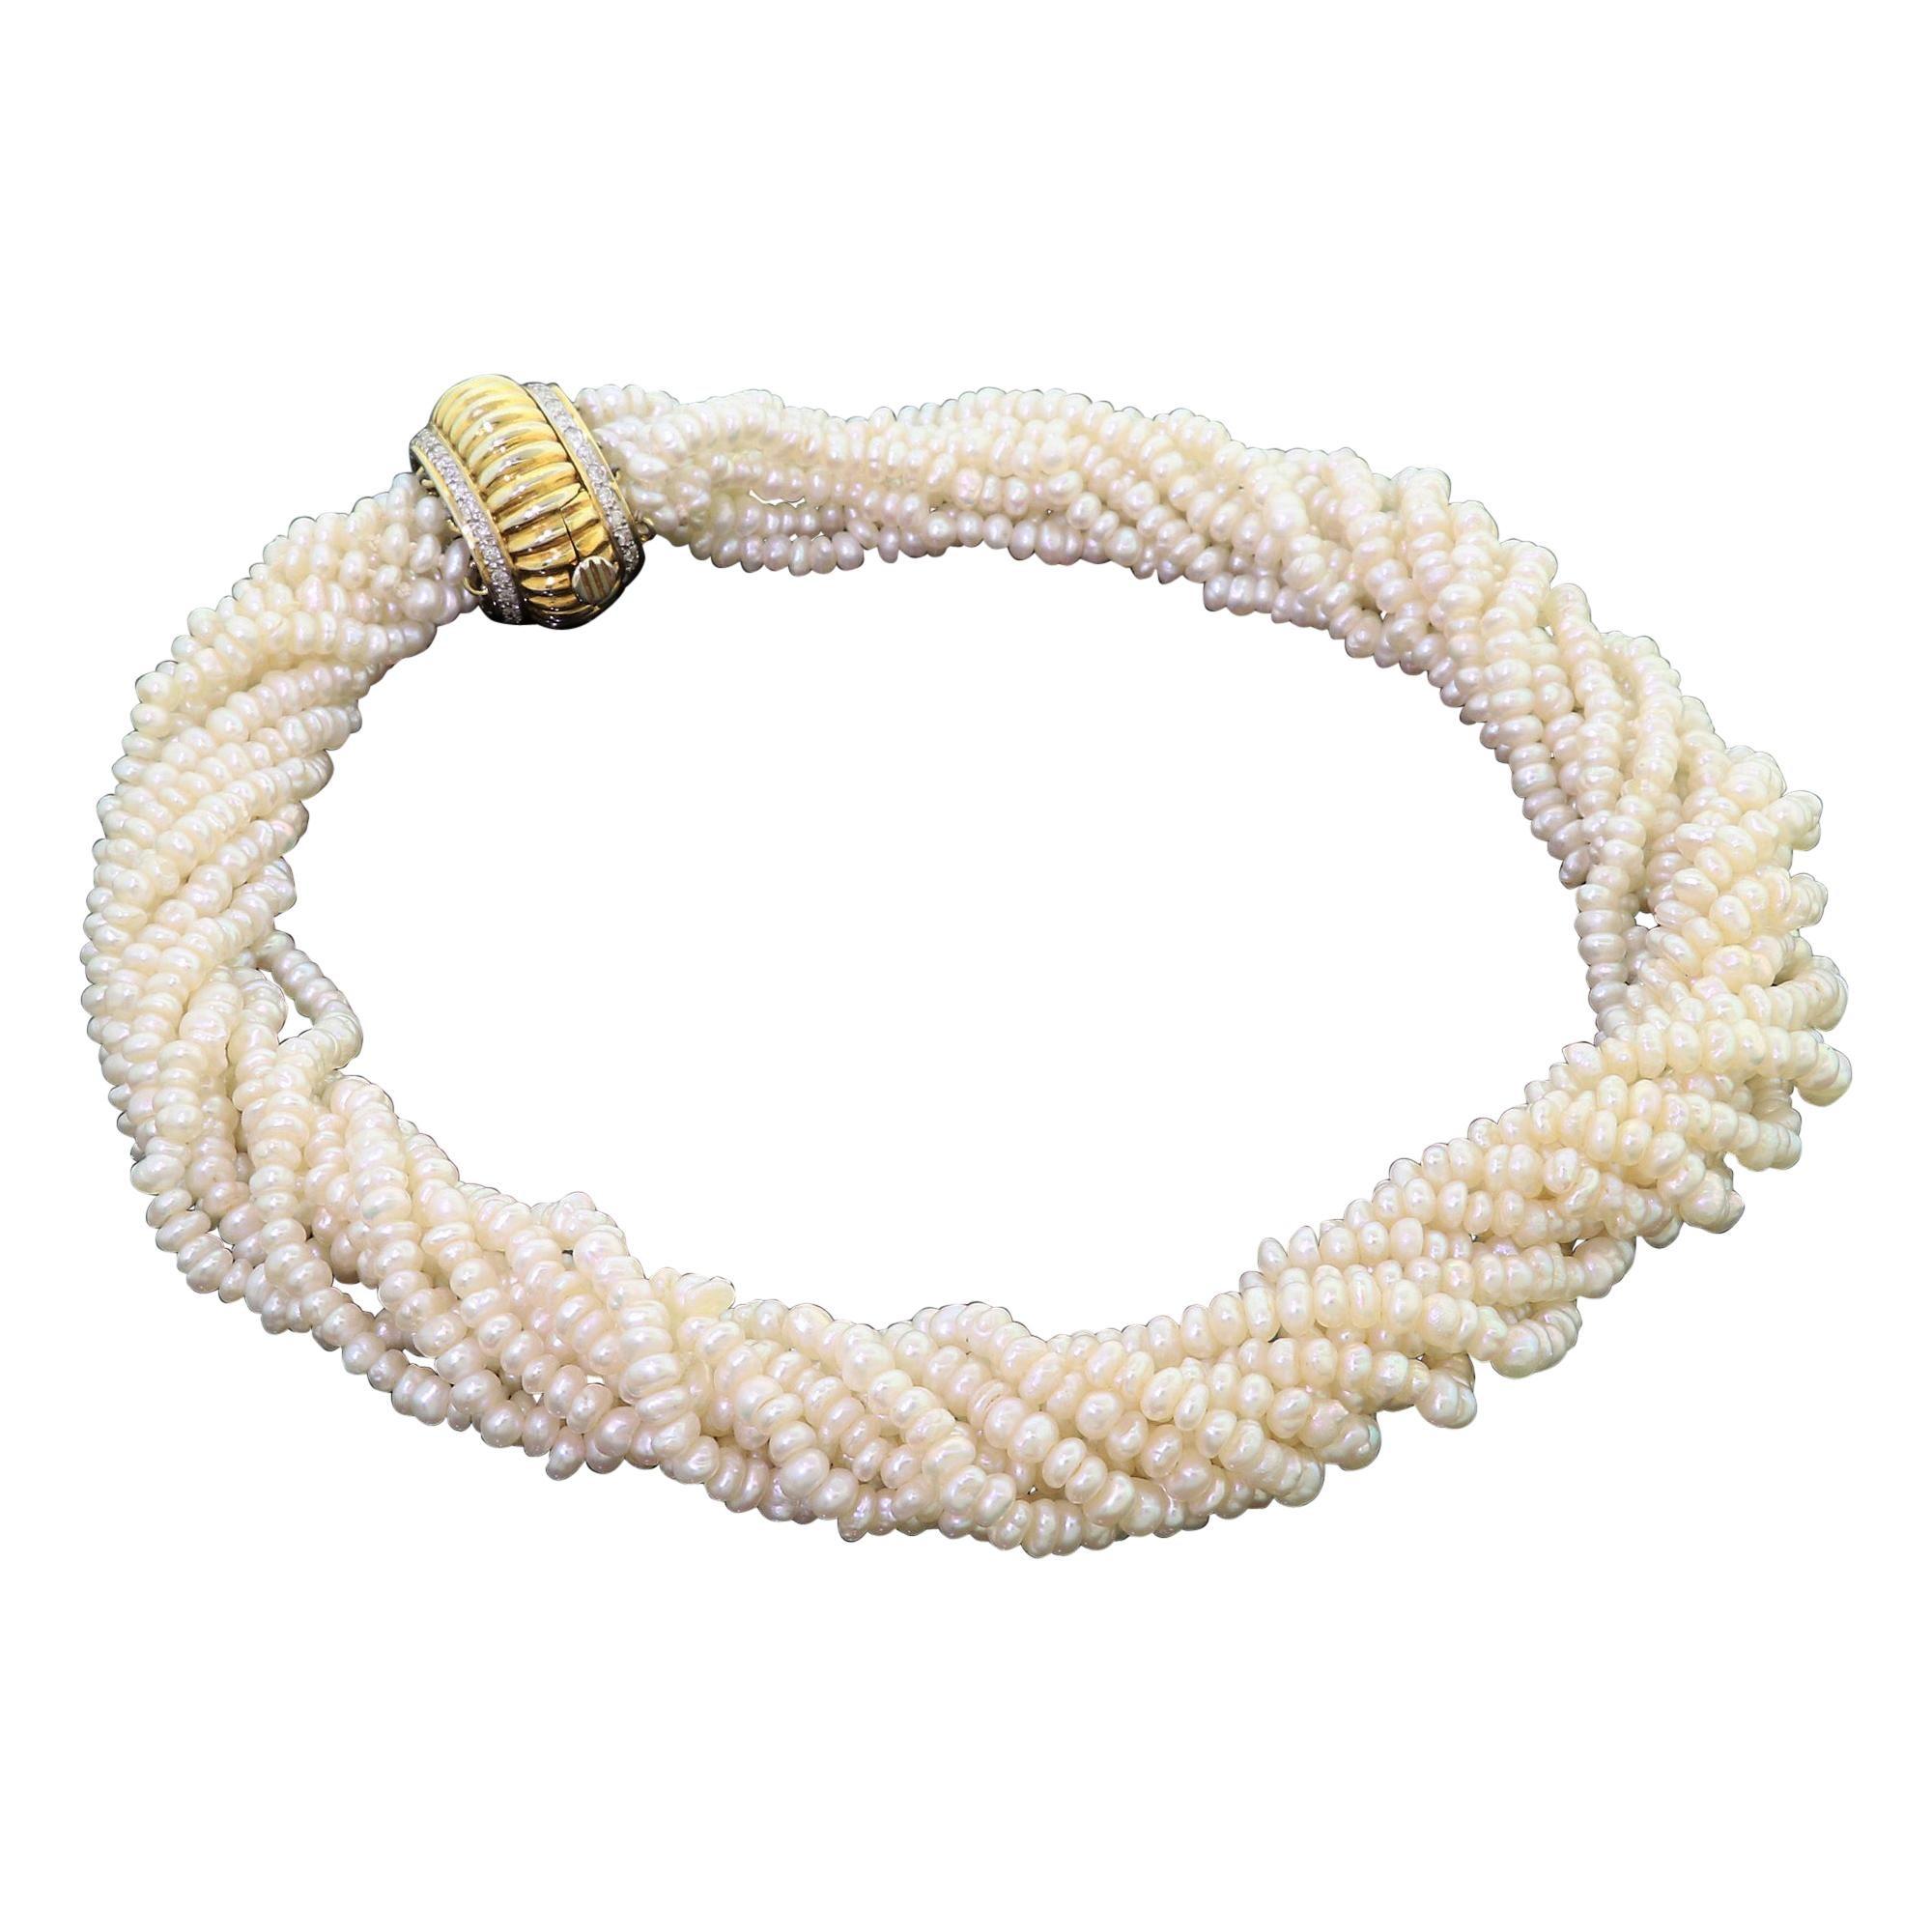 Vintage 14 Karat Gold Multi-Strand Pearl and Diamond Twisted Design Necklace 80G